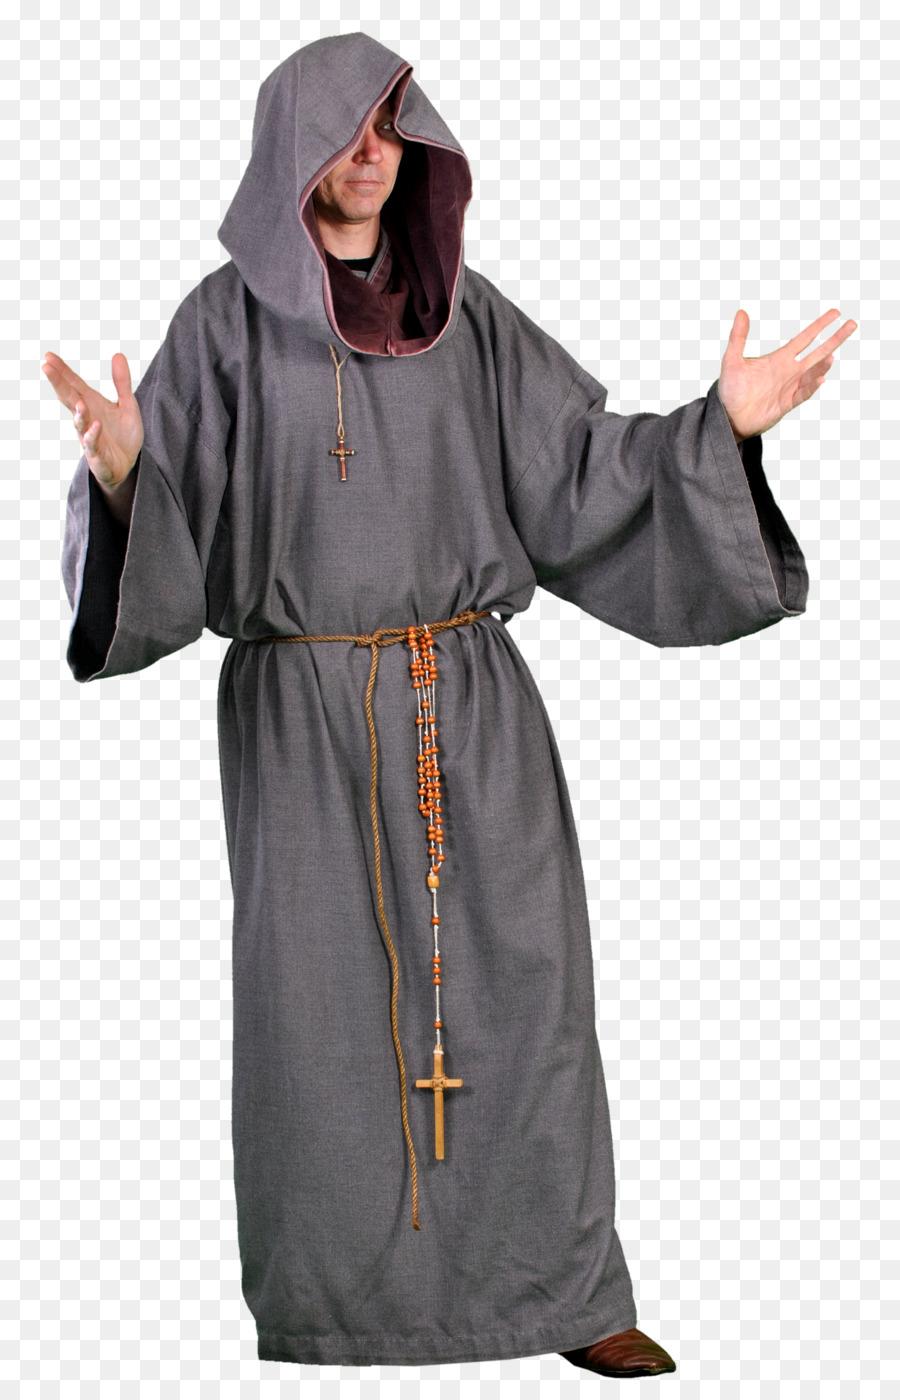 также ютуб найти фото монаха на прозрачной основе для рисунка или